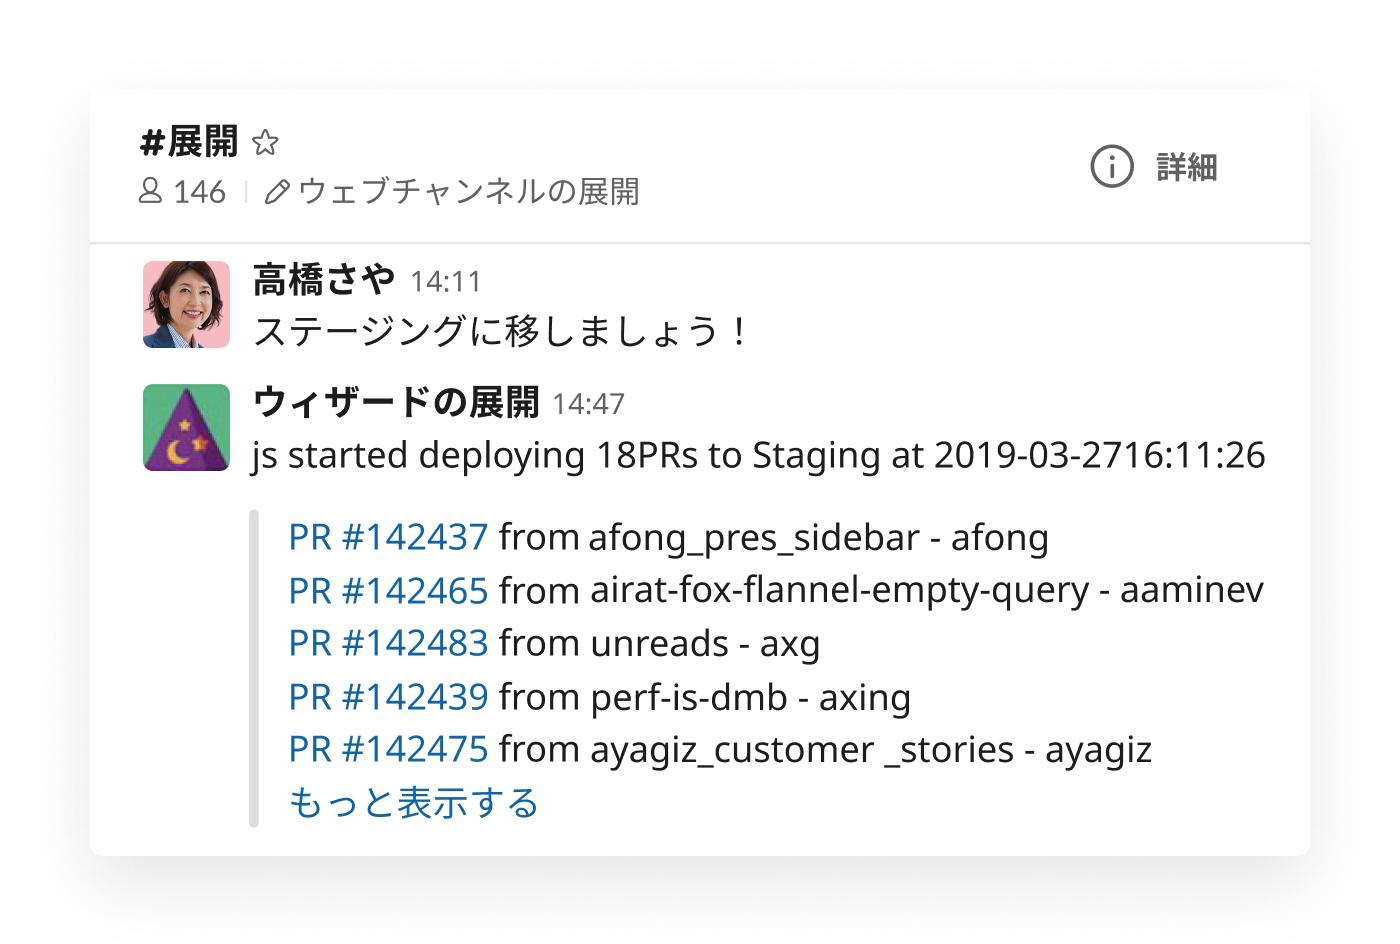 Slack での Deploy Wizard のインテグレーションにより、進捗のアップデートを投稿